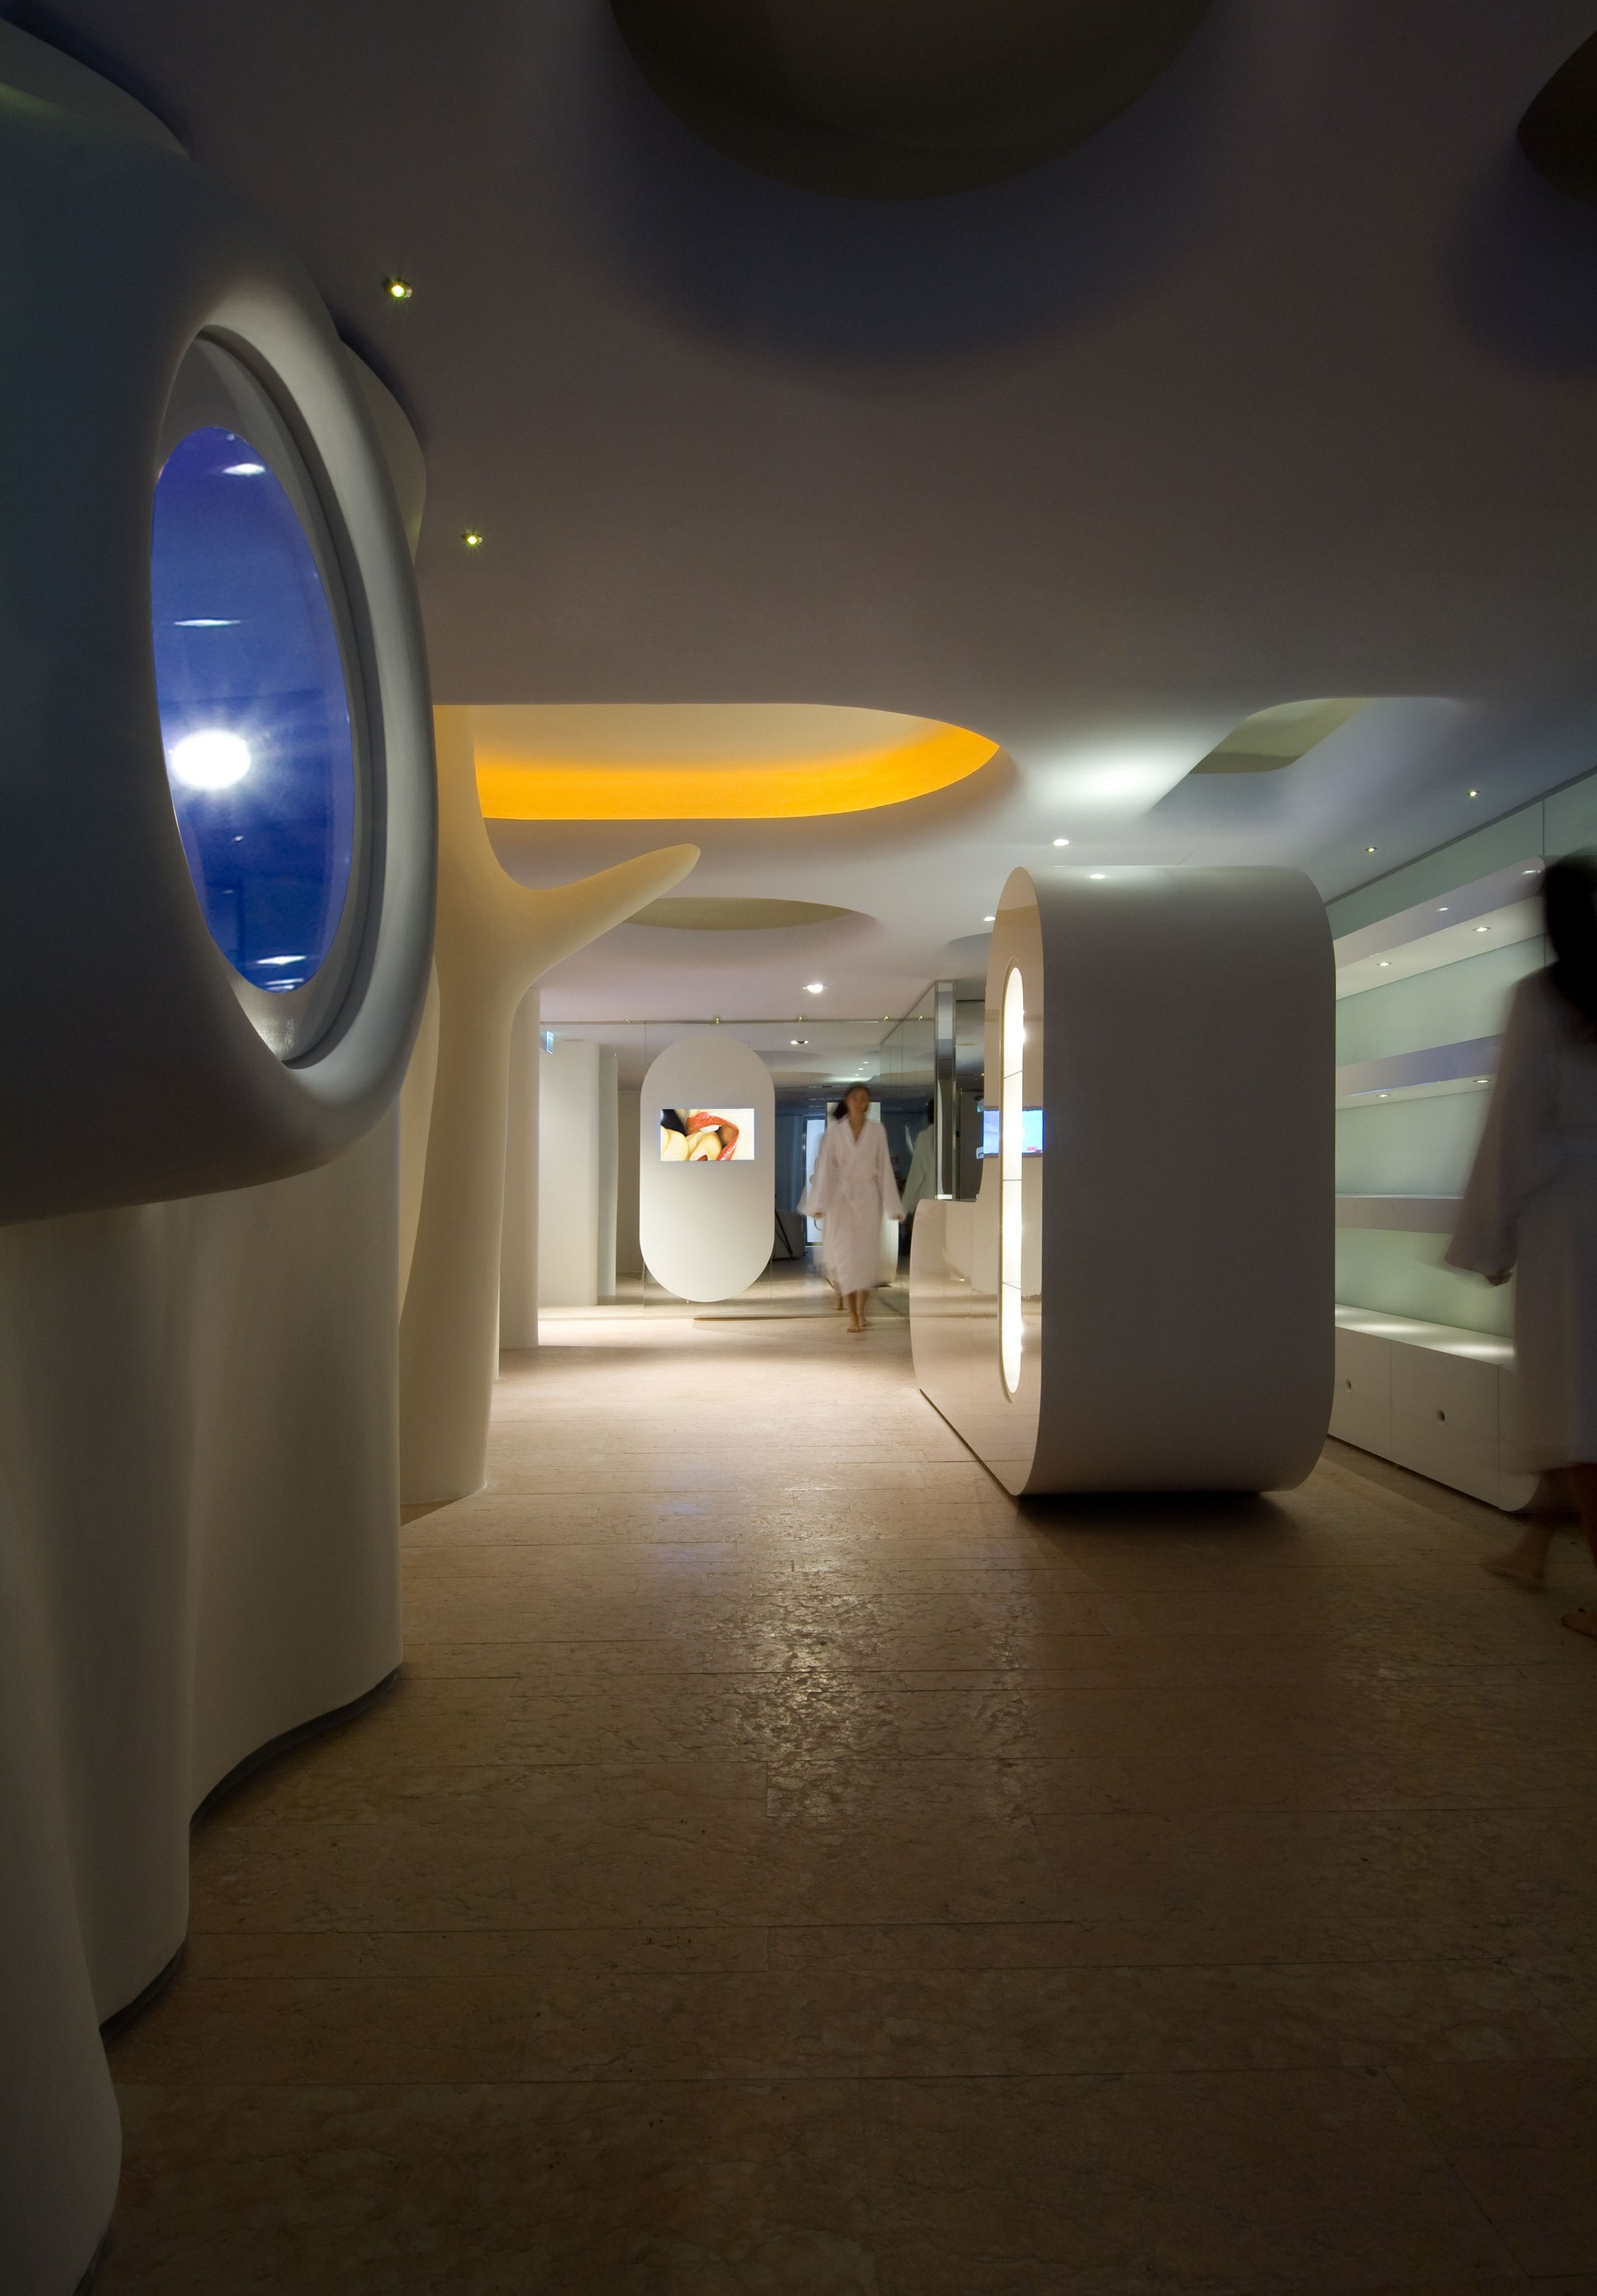 Gallery of Exedra Nice Hotel Spa / Simone Micheli - 9